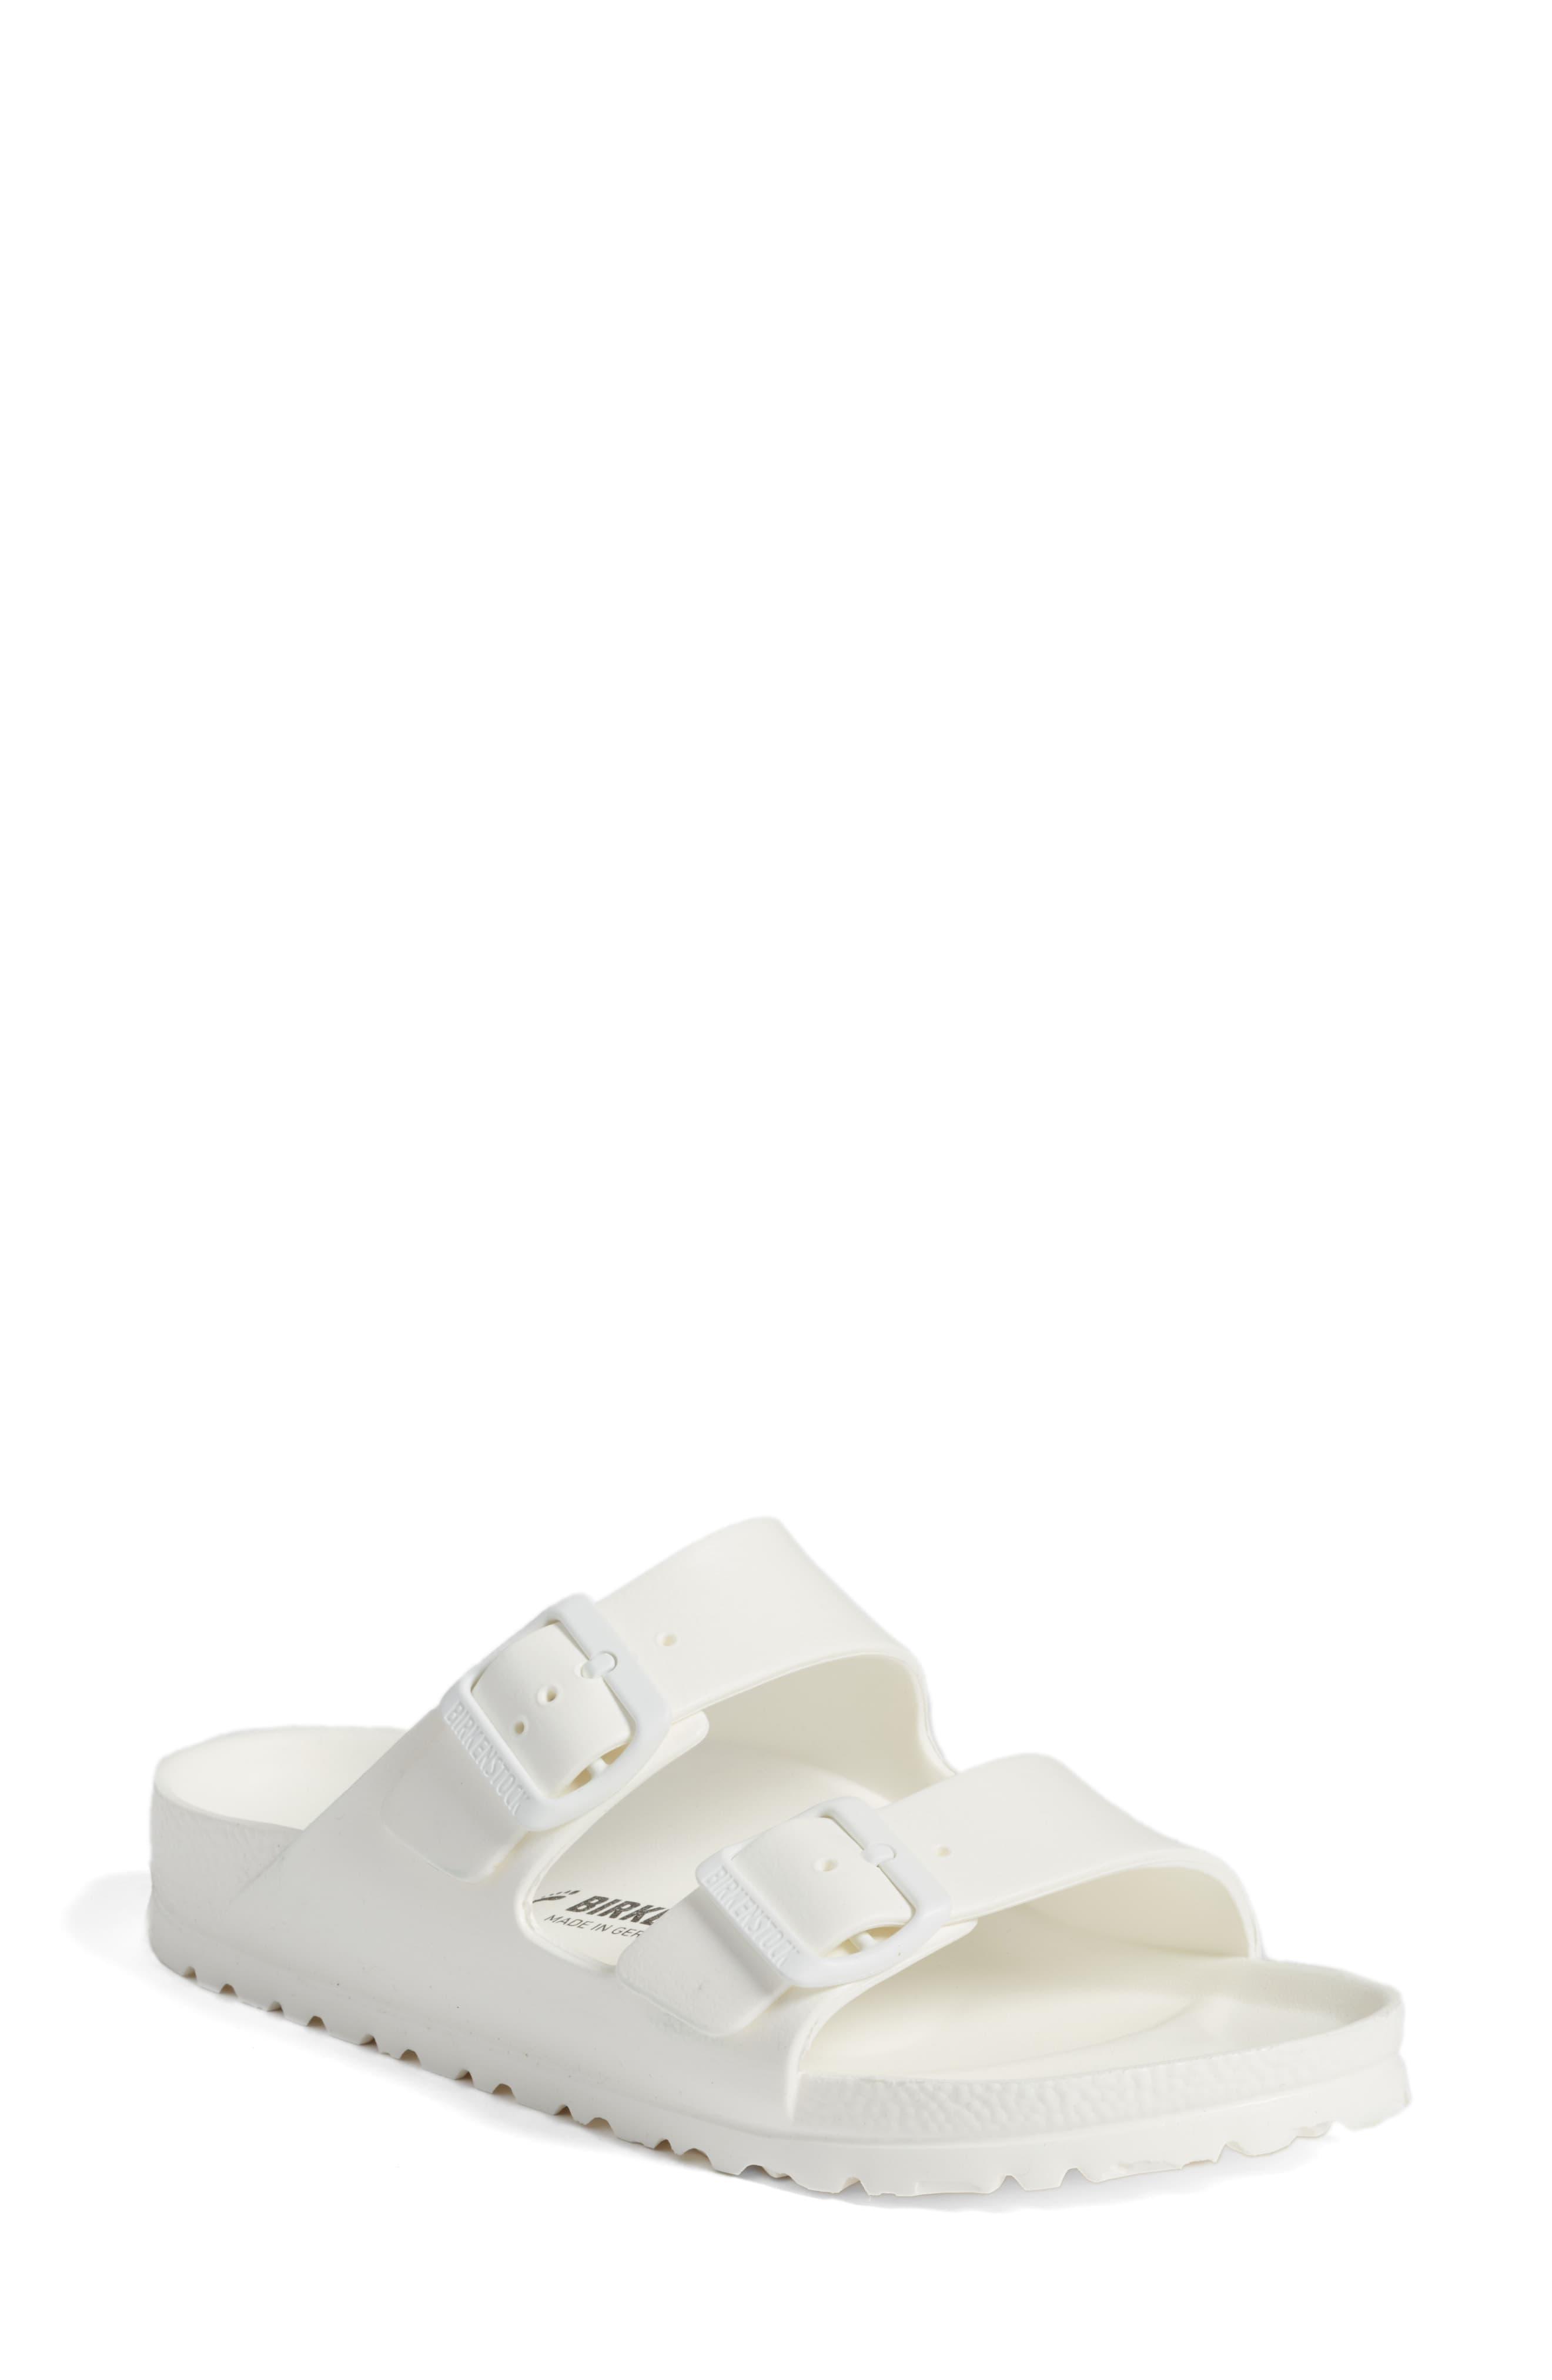 f588cacc768 Birkenstock Essentials Arizona Sandals in White - Lyst